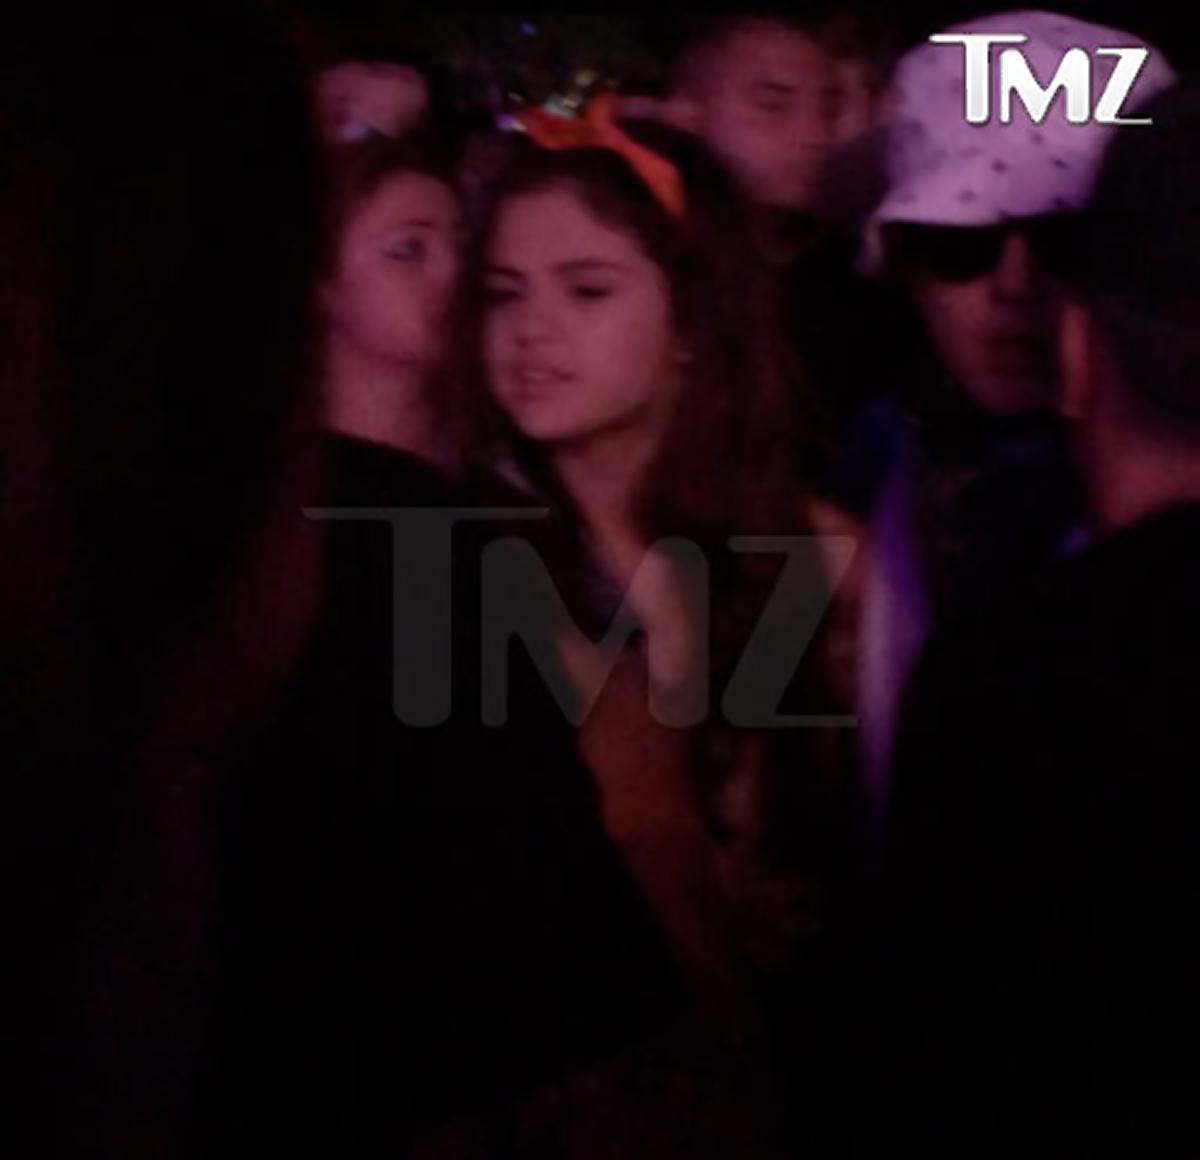 Justin Bieber và Selena Gomez thân mật tại lễ hội Coachella - Ảnh 2